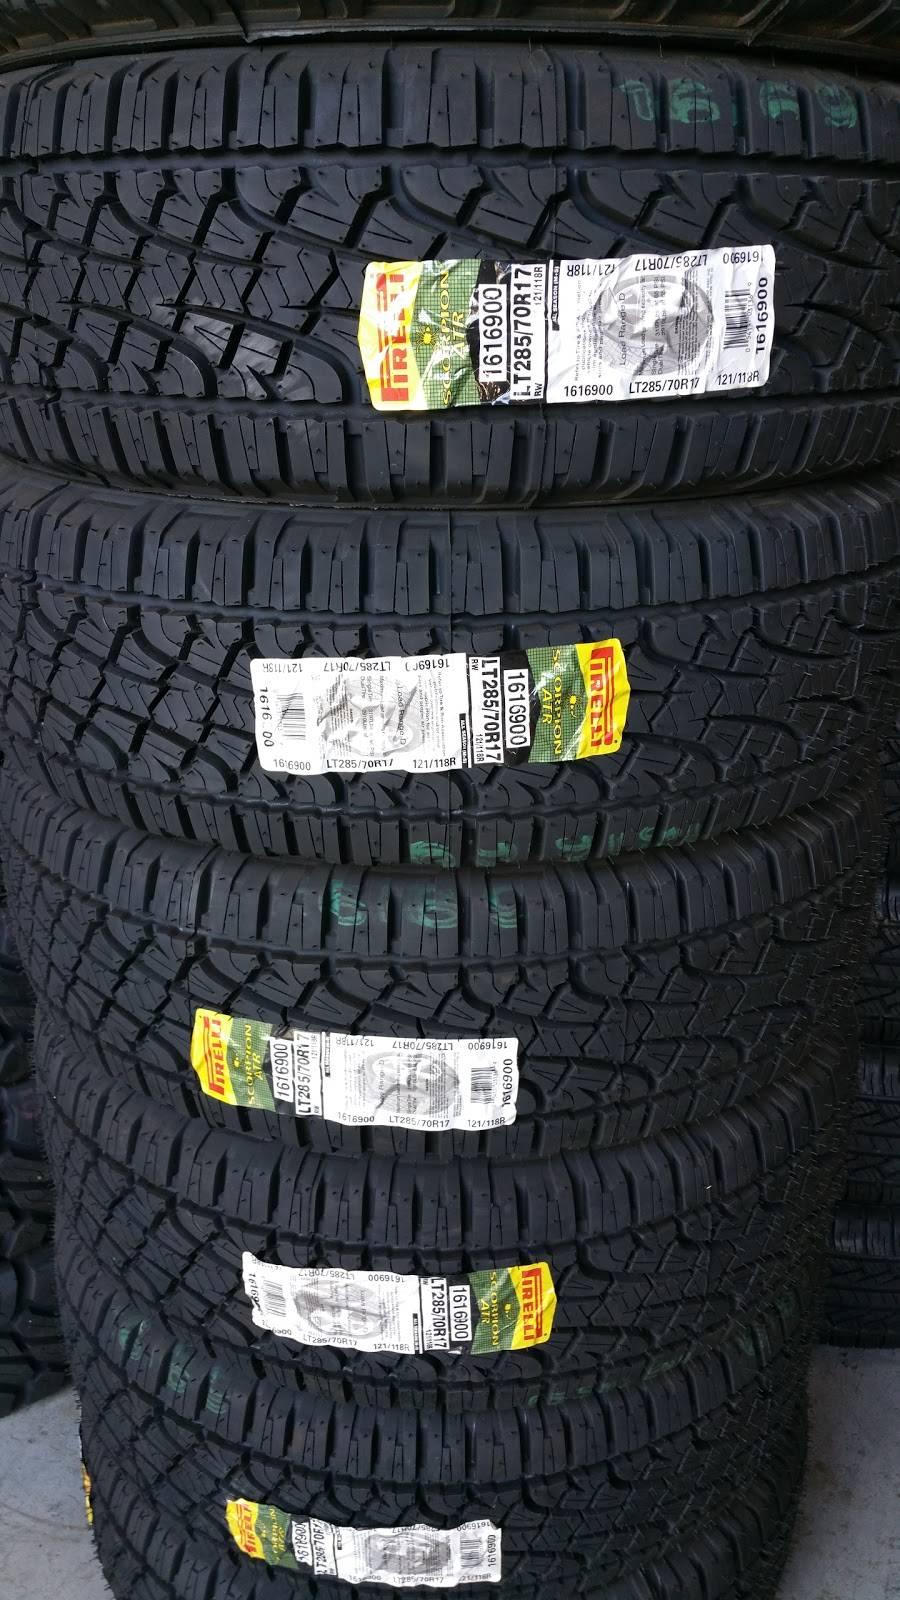 SCW Tires - car repair    Photo 1 of 2   Address: 3410 Bunkerhill Dr, North Las Vegas, NV 89032, USA   Phone: (702) 636-6585